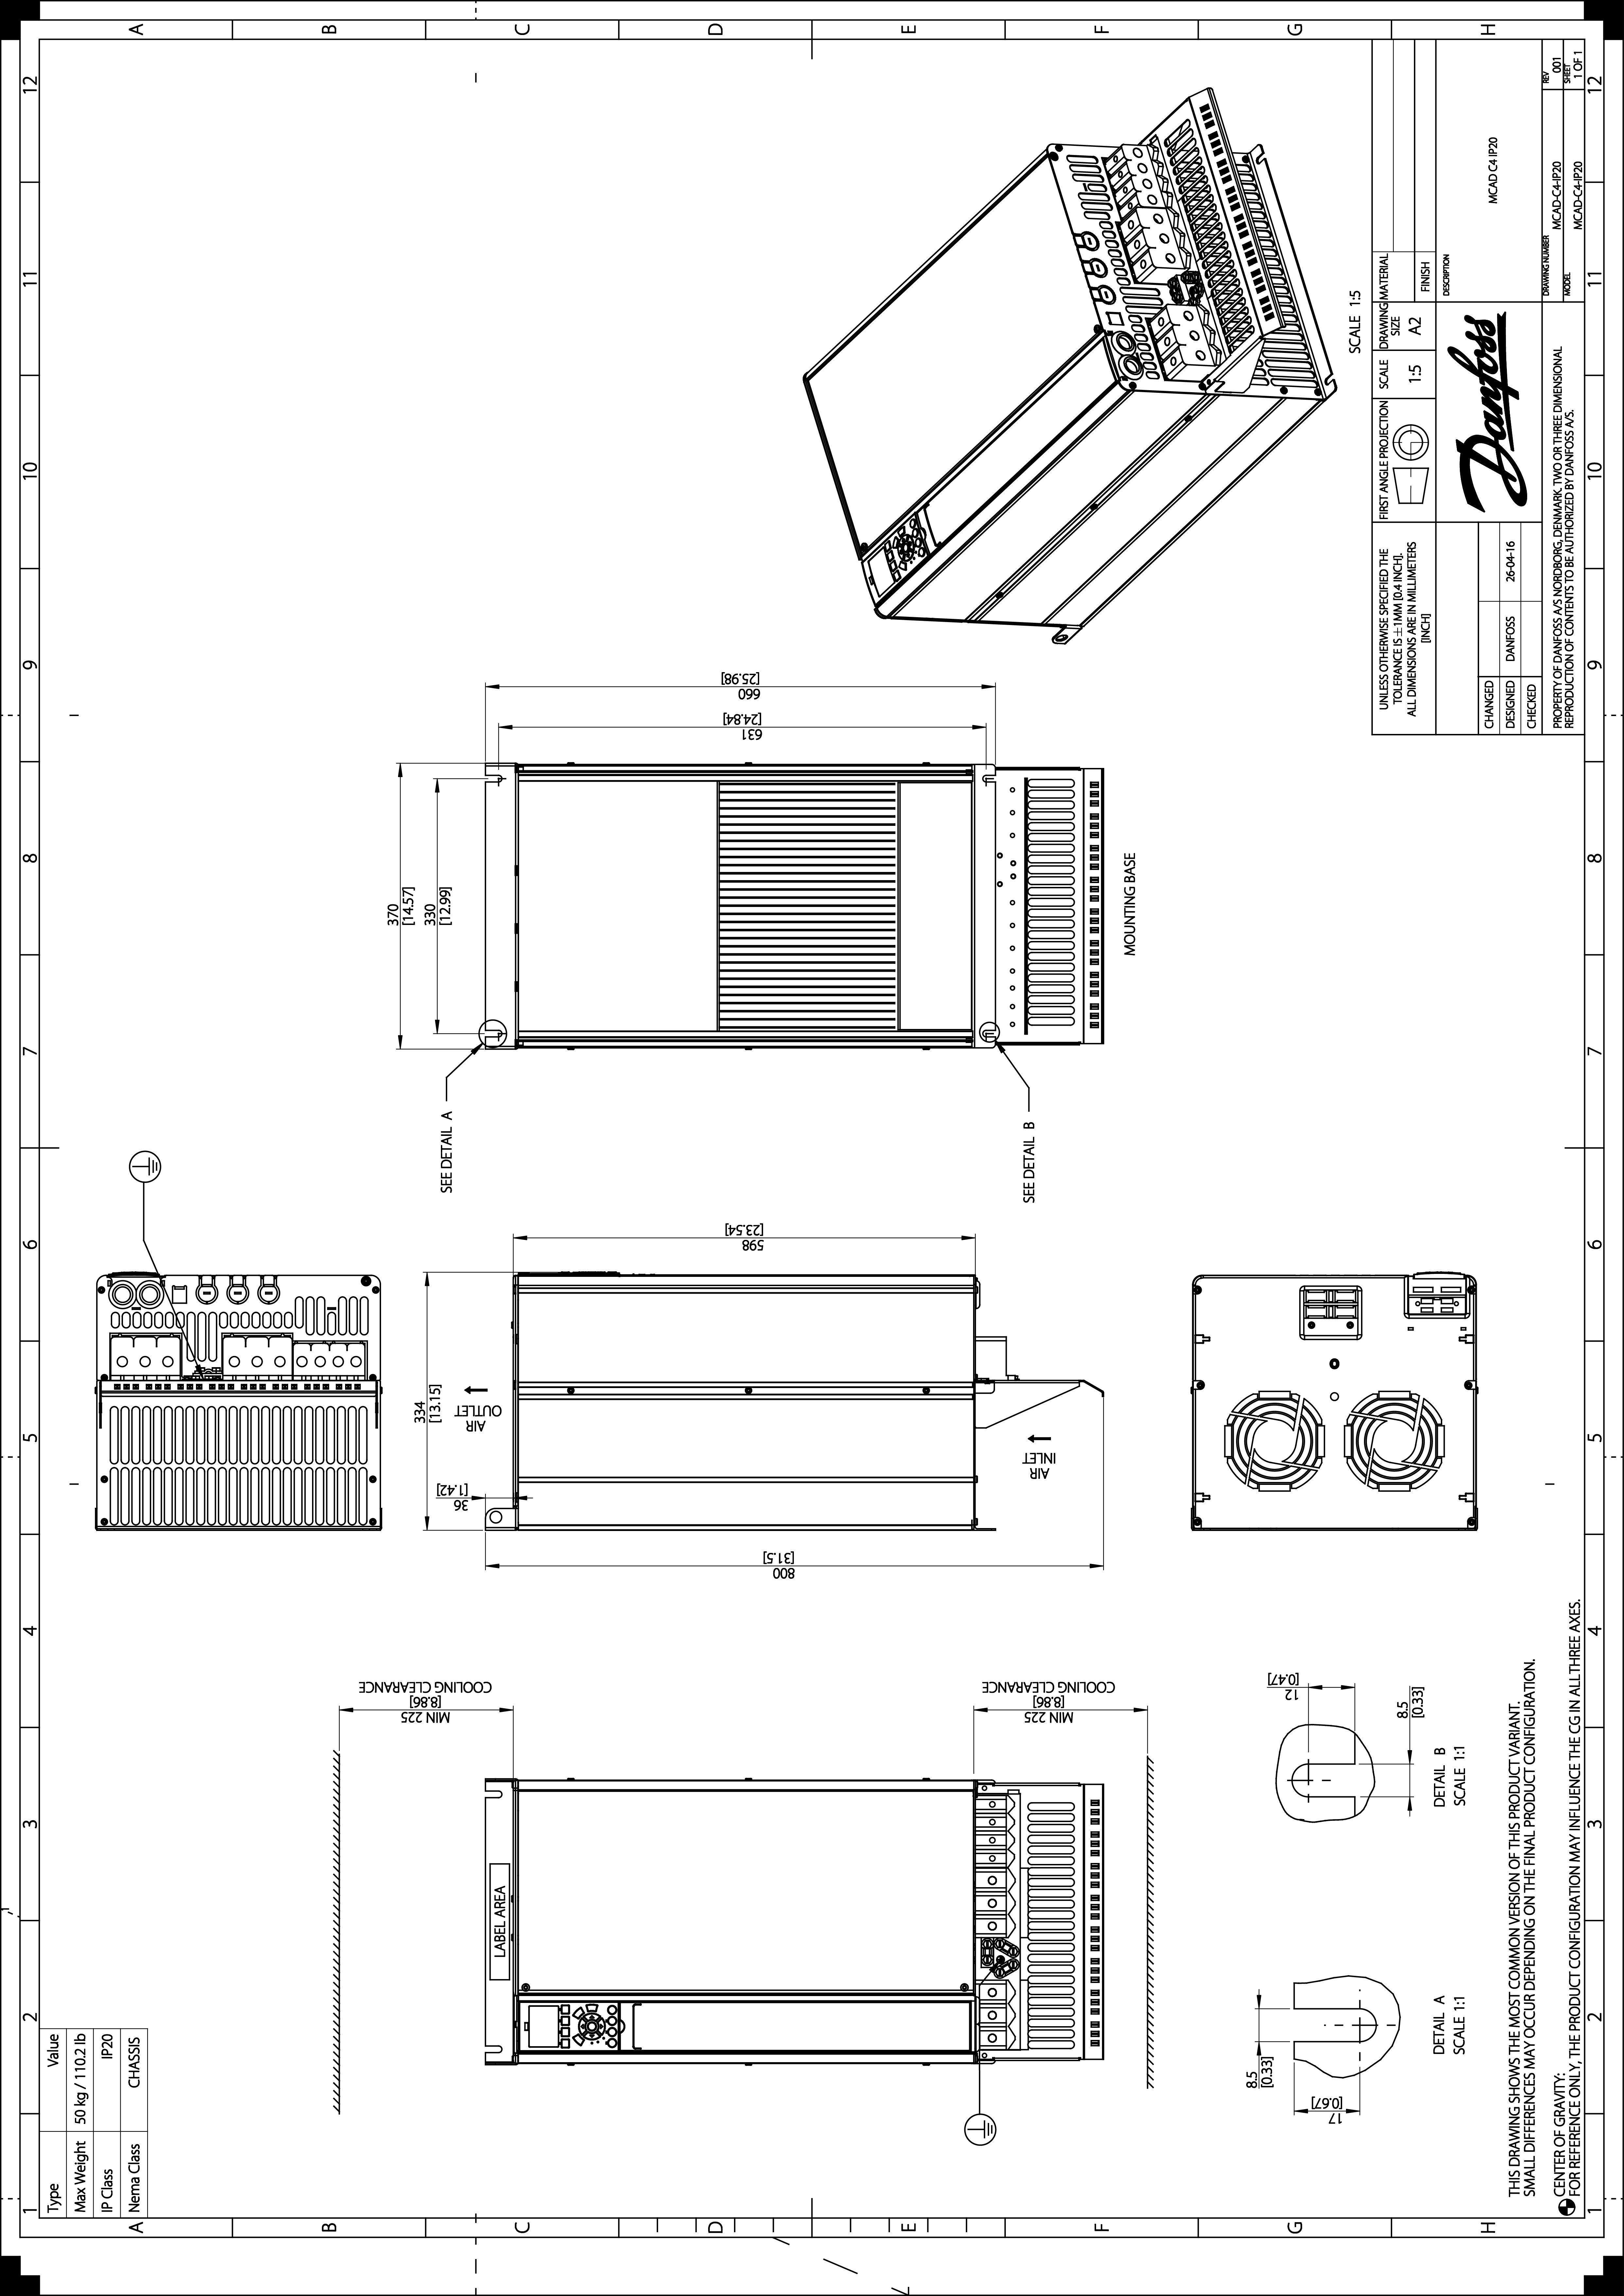 small resolution of danfoss wiring diagram online wiring diagram ansul wiring diagram danfoss wiring diagram